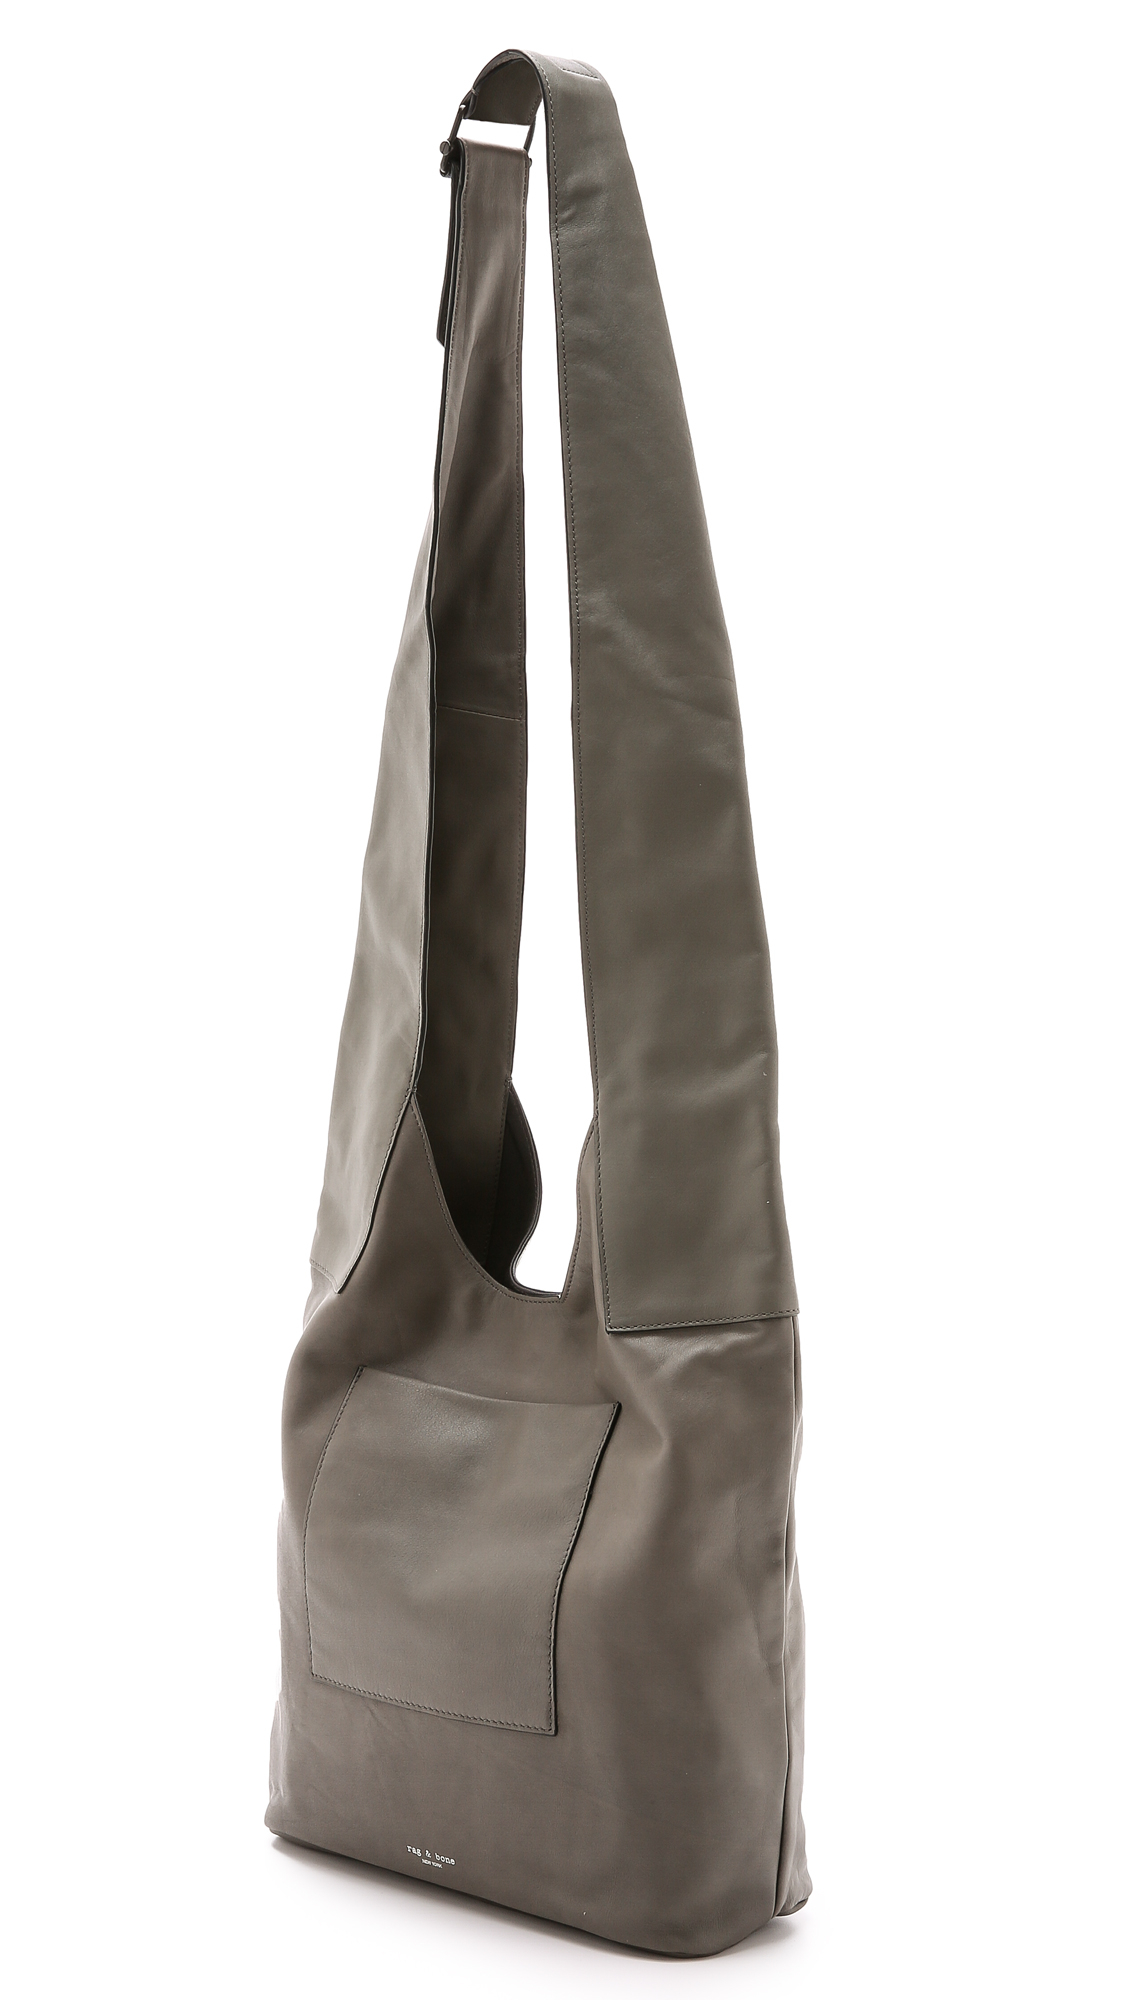 Rag & Bone Goa Cross Body Bag - Smoke in Grey